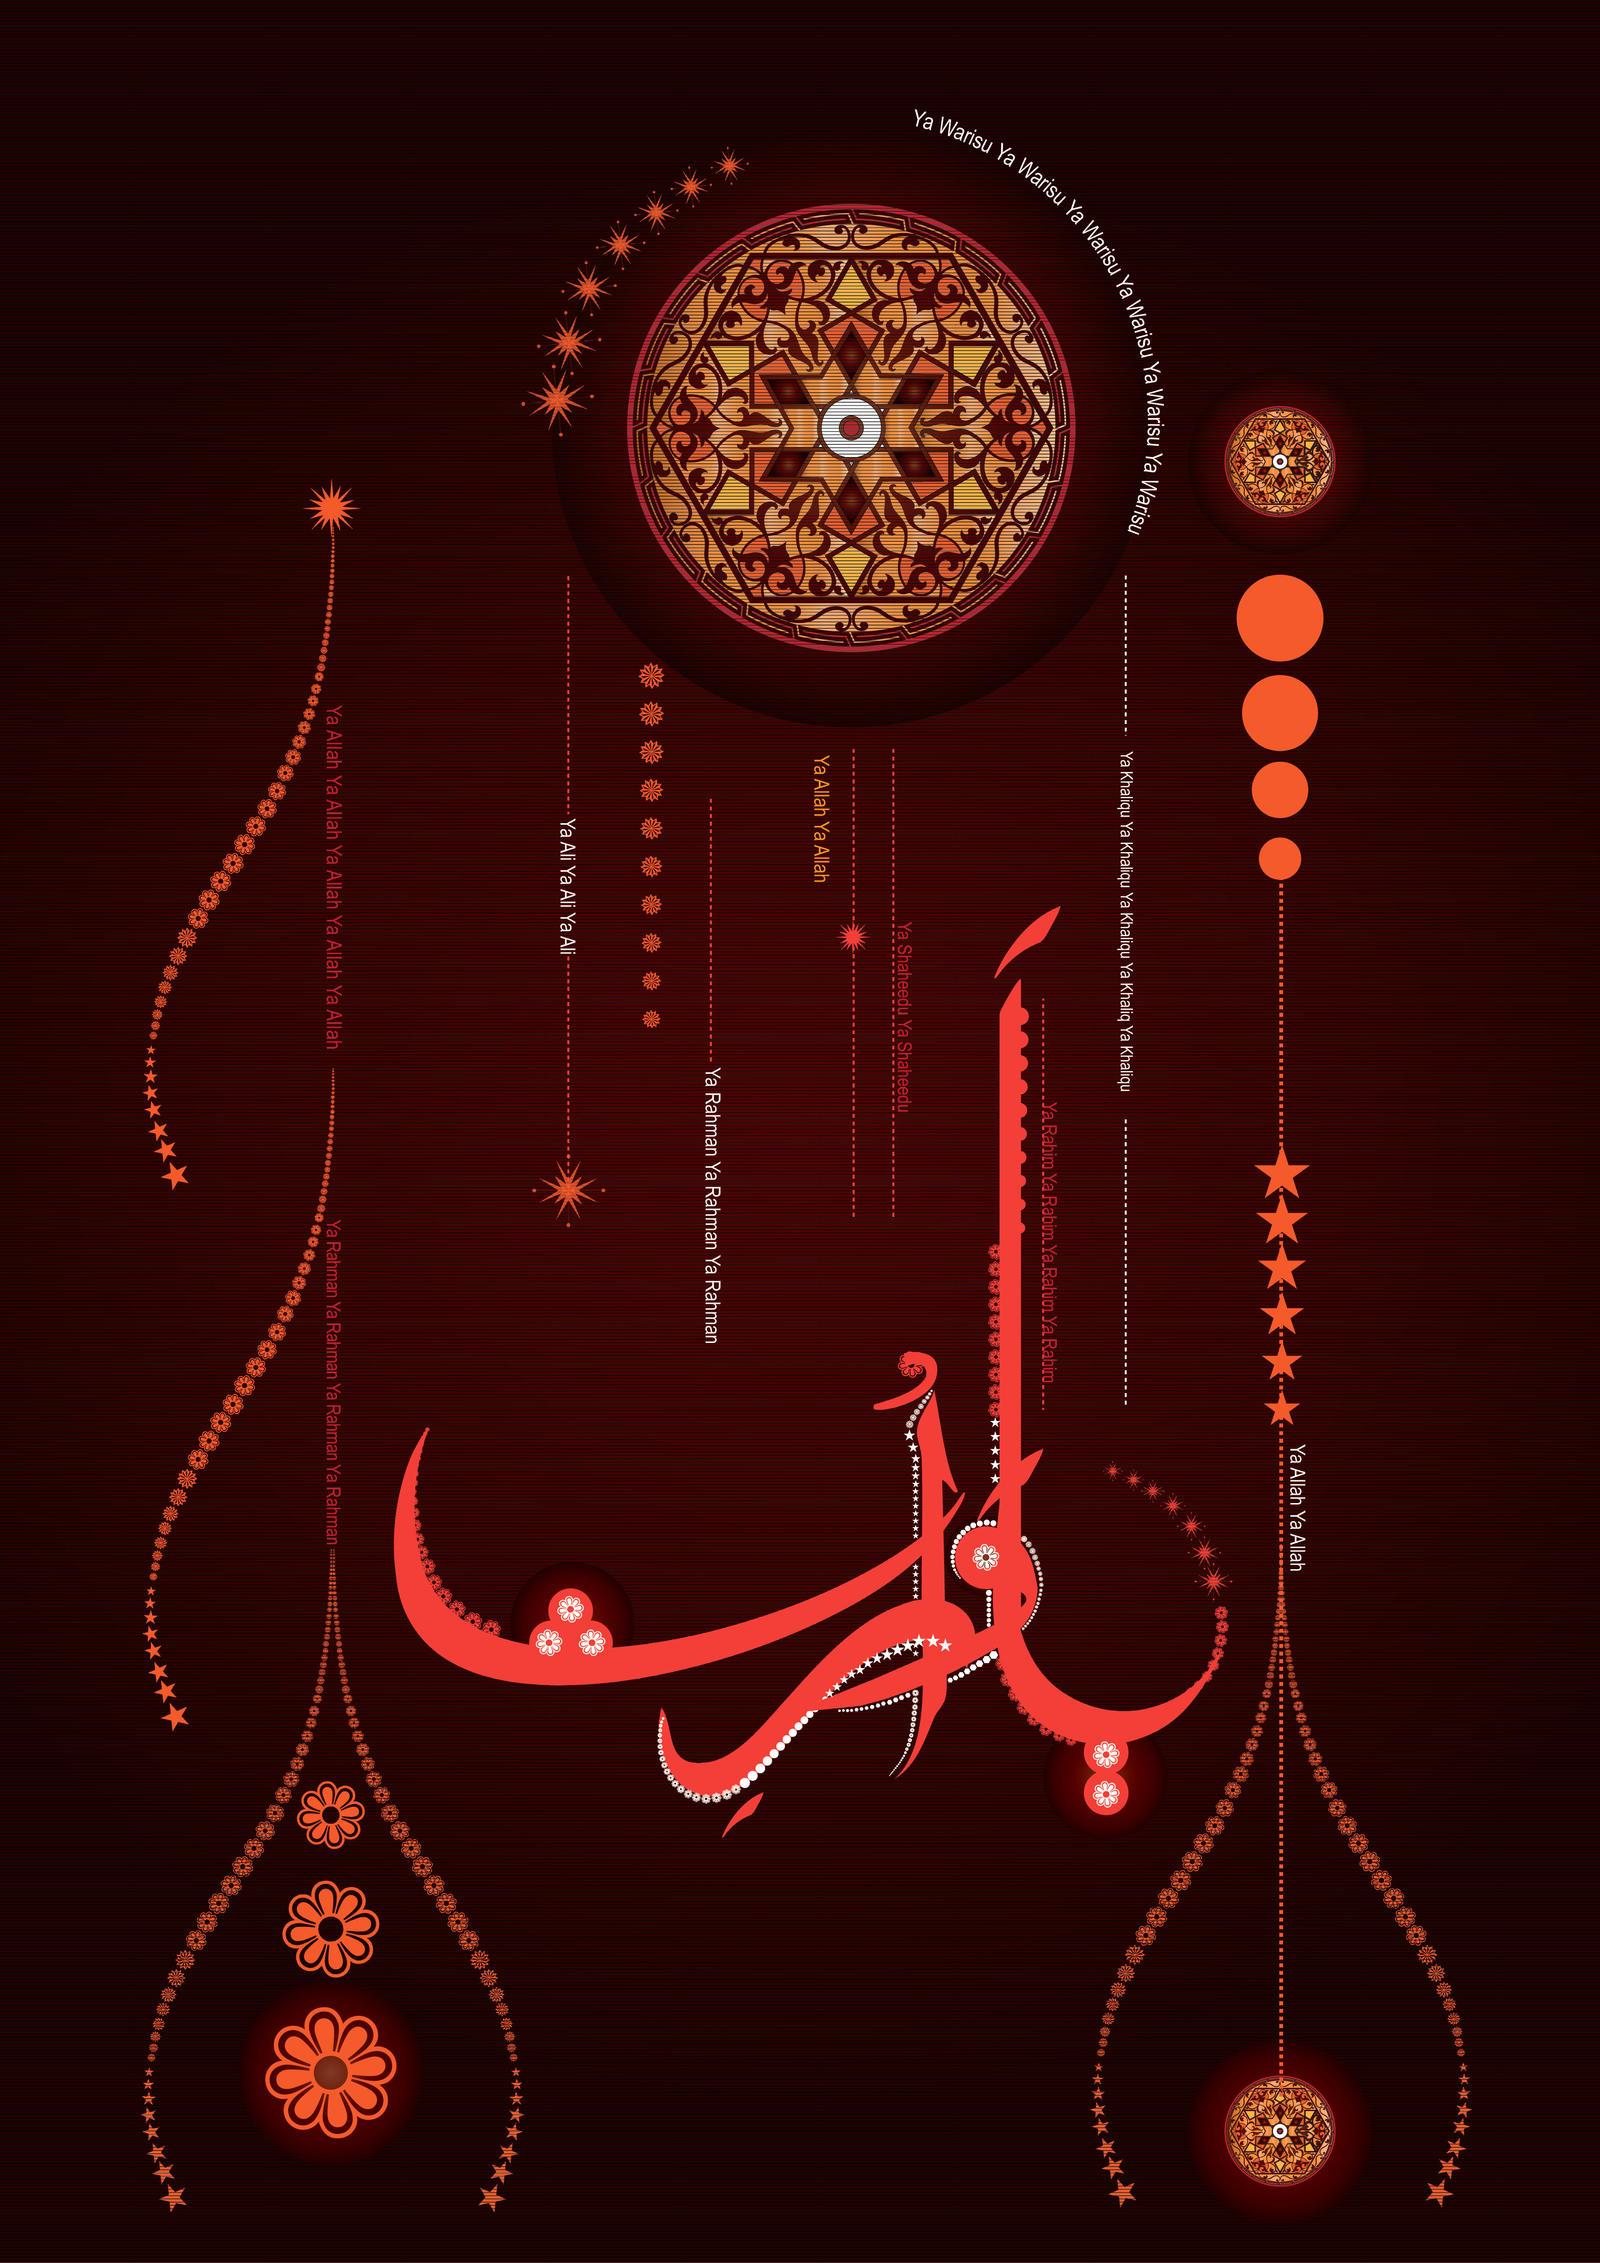 Ya Waris by sheikhrouf23